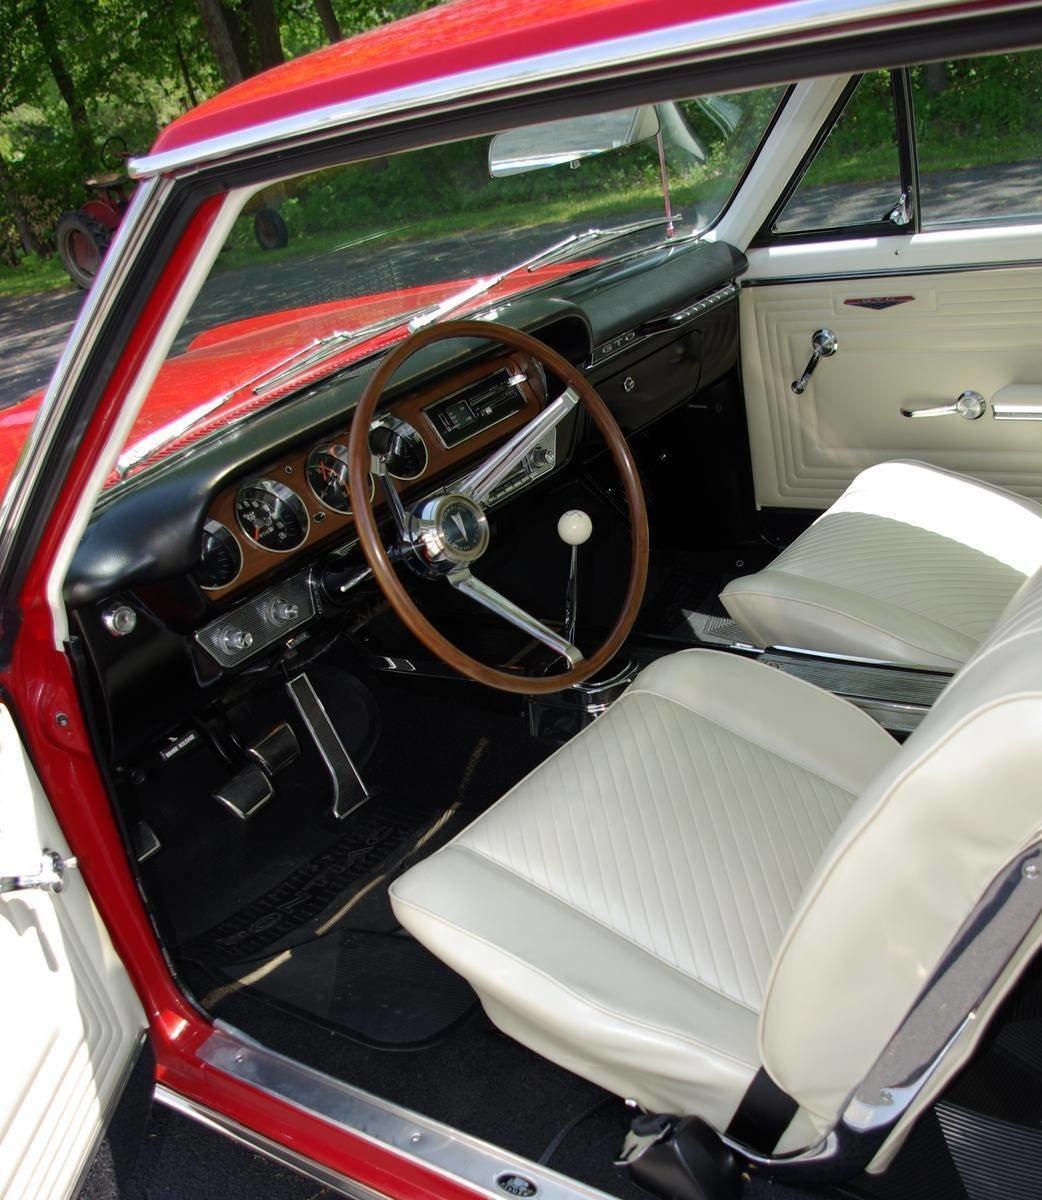 1965 Pontiac Gto Saratoga Auto Auction Phs Documented 4 Speed Tri Power 389 Red Black